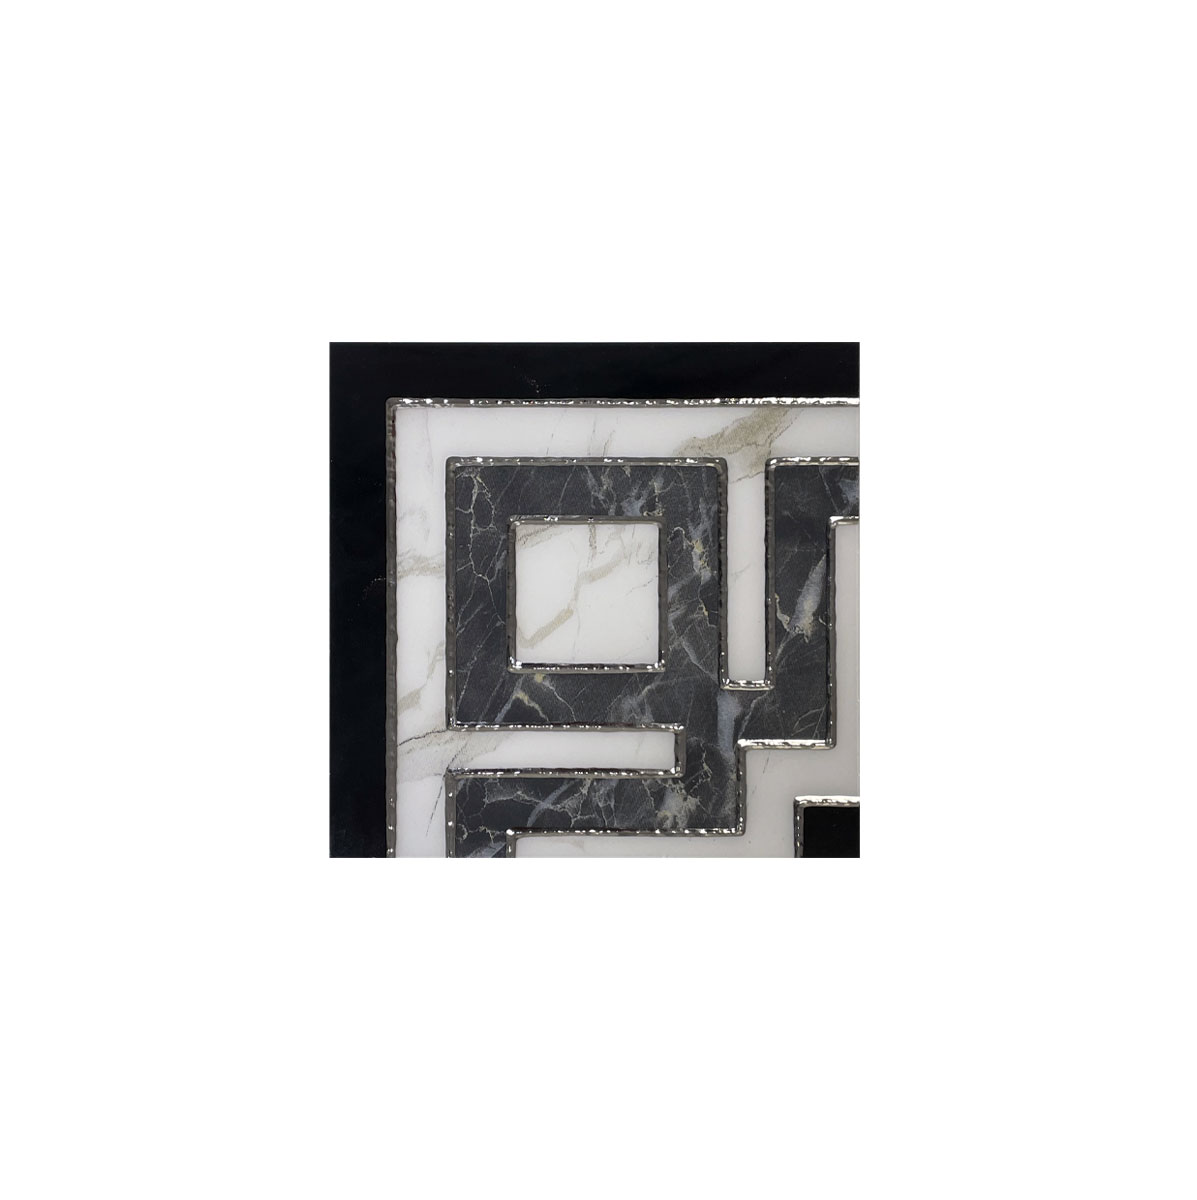 HALLMARK BORDER L00029 6X6 WHITE GREY BLACK